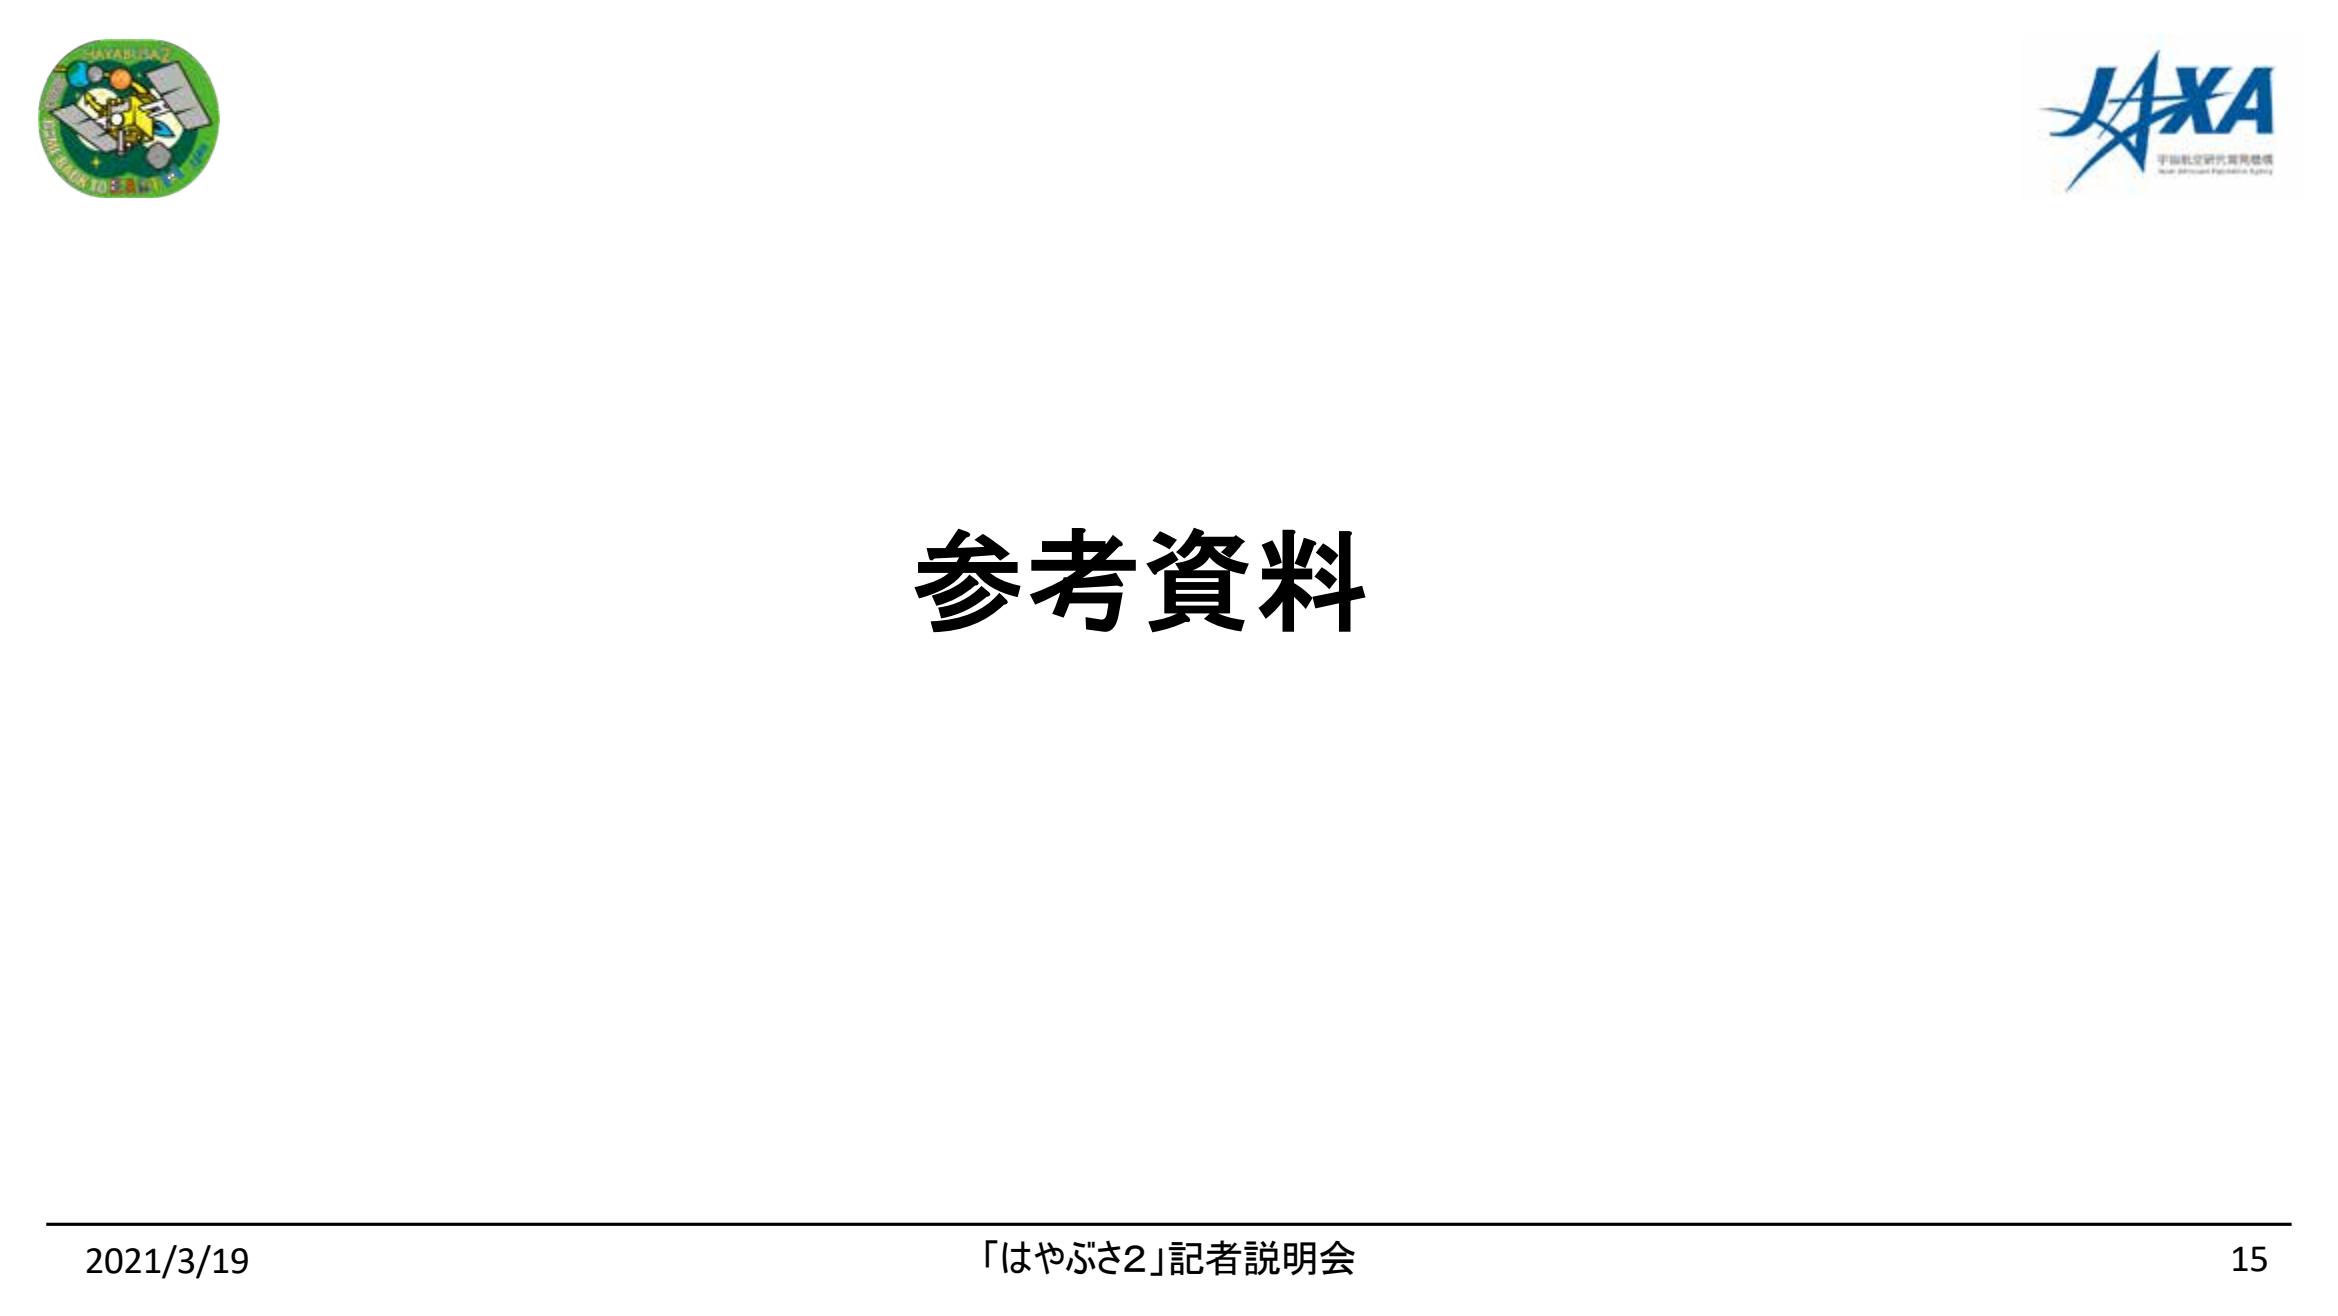 f:id:Imamura:20210319144533p:image